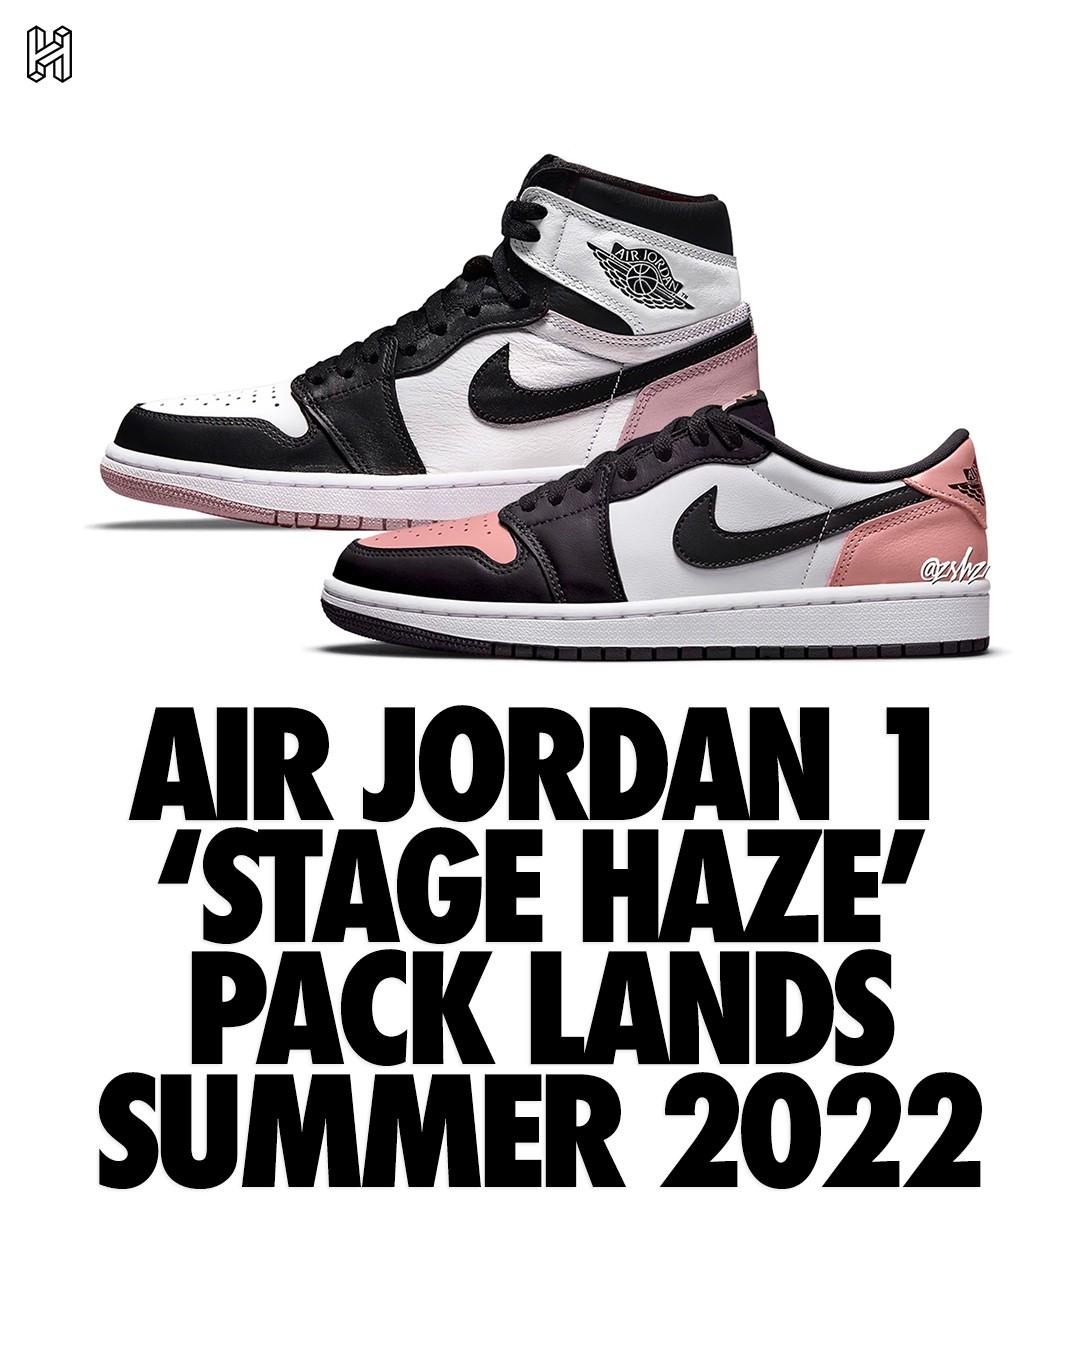 Stage Haze,PACK LANDS,Low,High  酷似天价联名!两双全新「黑粉脚趾」AJ1 曝光!